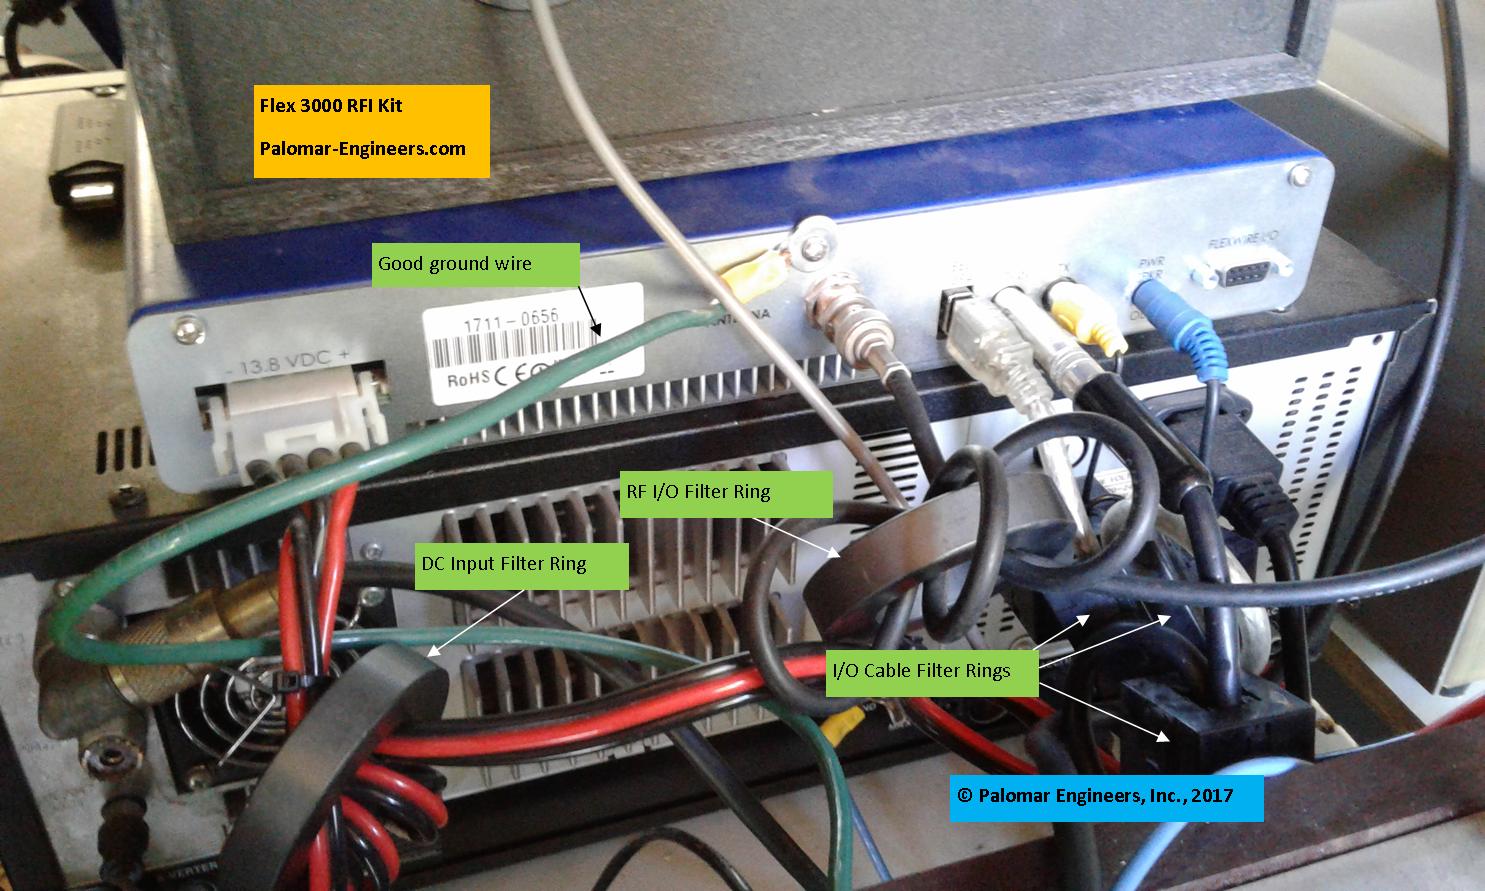 Flex Radio 3000 Transceiver RFI and Noise Reduction Kit, RFI Range 1-60 Mz, 6 Filters